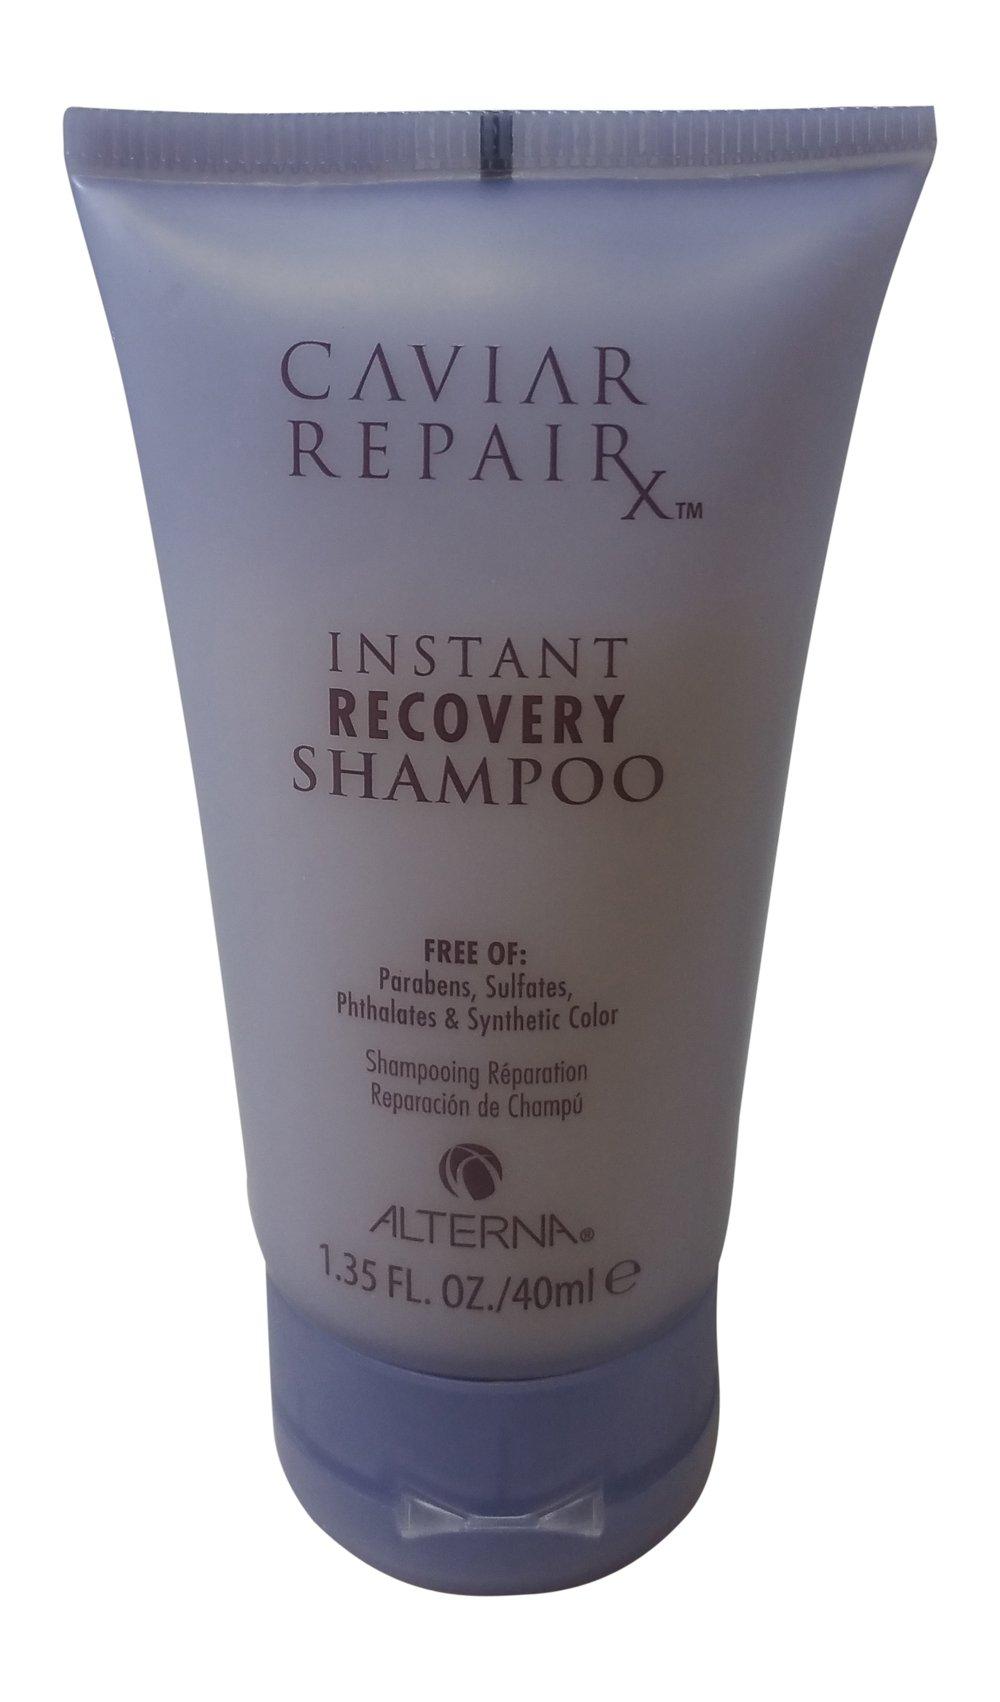 Alterna Caviar Repair Travel Trio: Instant Recovery Shampoo & Conditioner & Re-Texturizing Protein Cream 1.35 oz each by Alterna (Image #4)